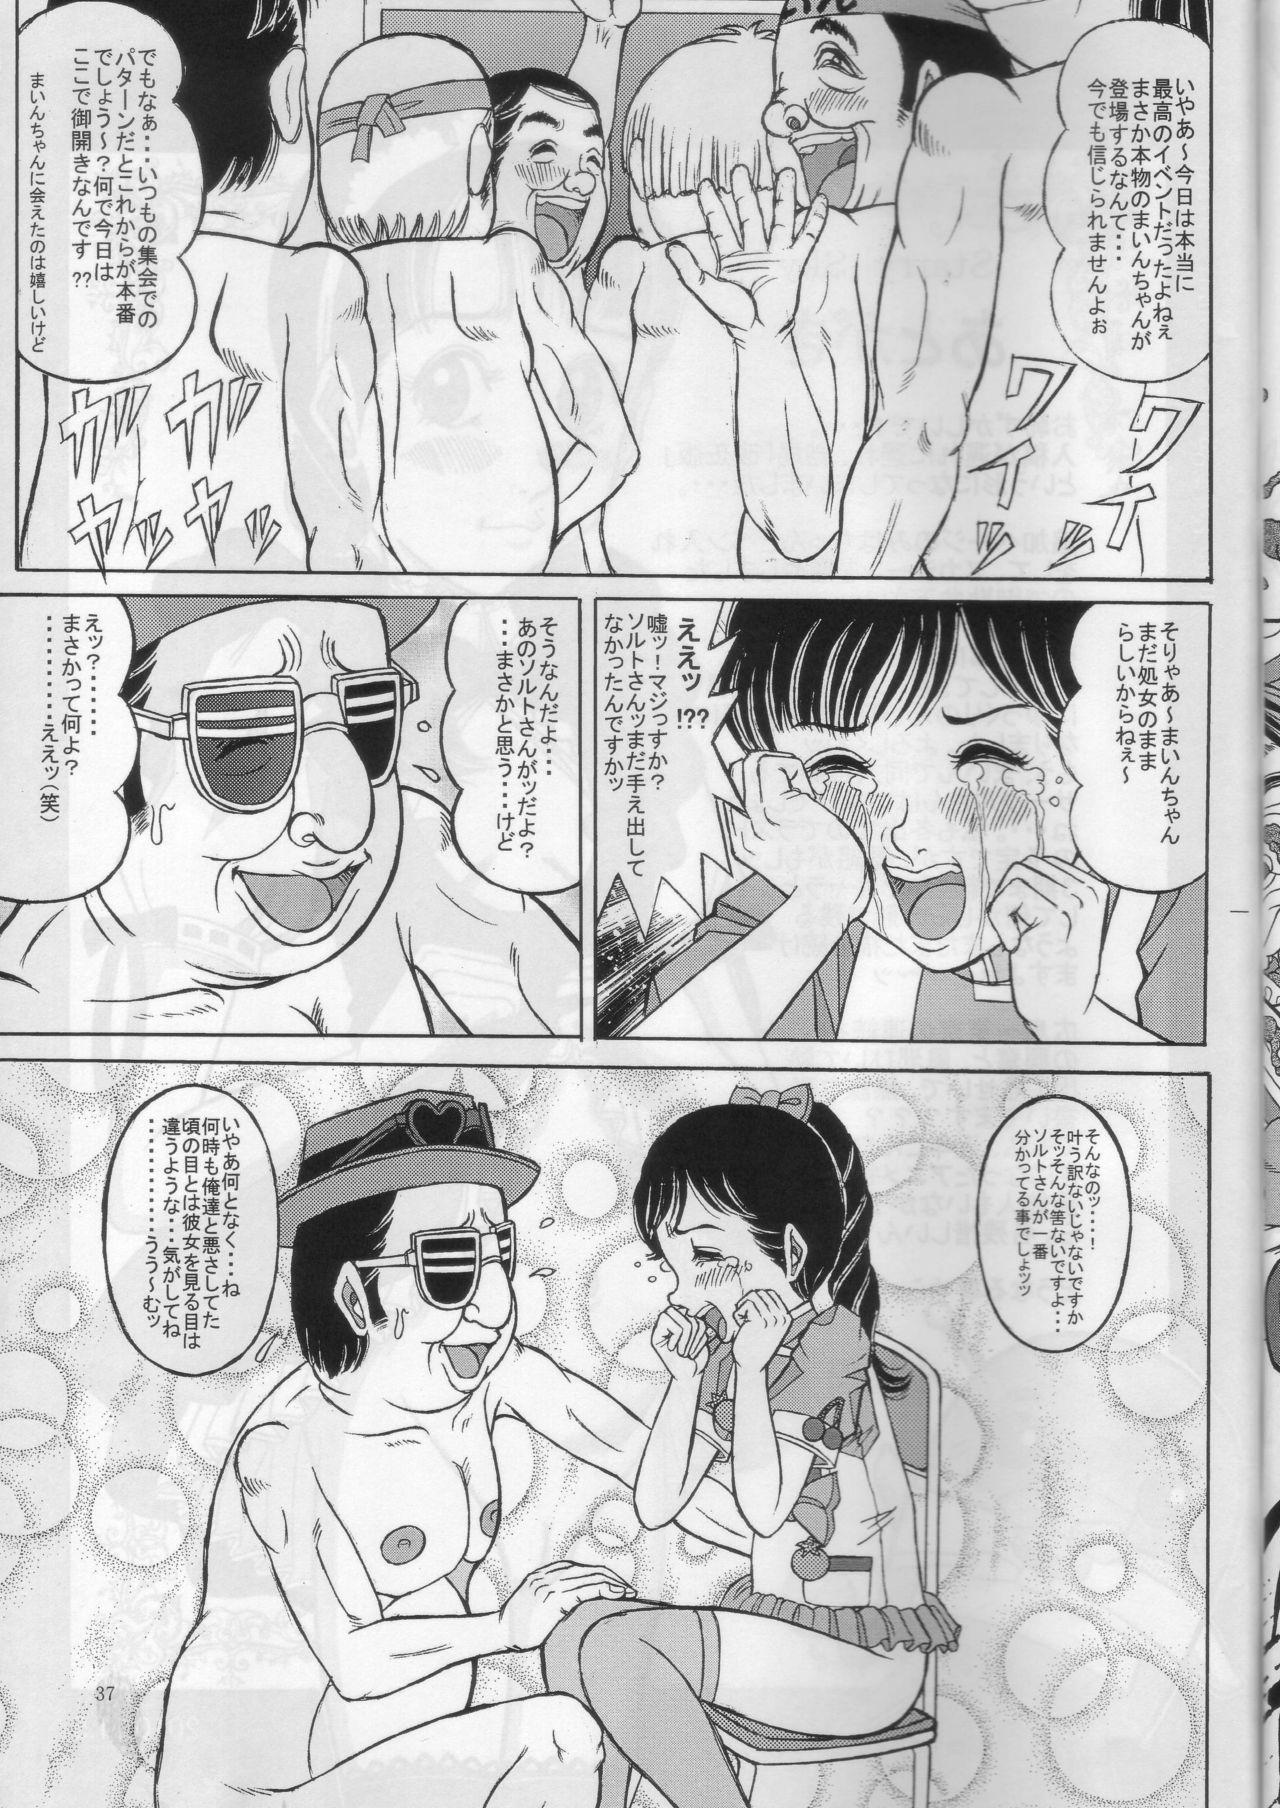 Minna de Yokumite Ara★Domo♪ Kaiseiban 35